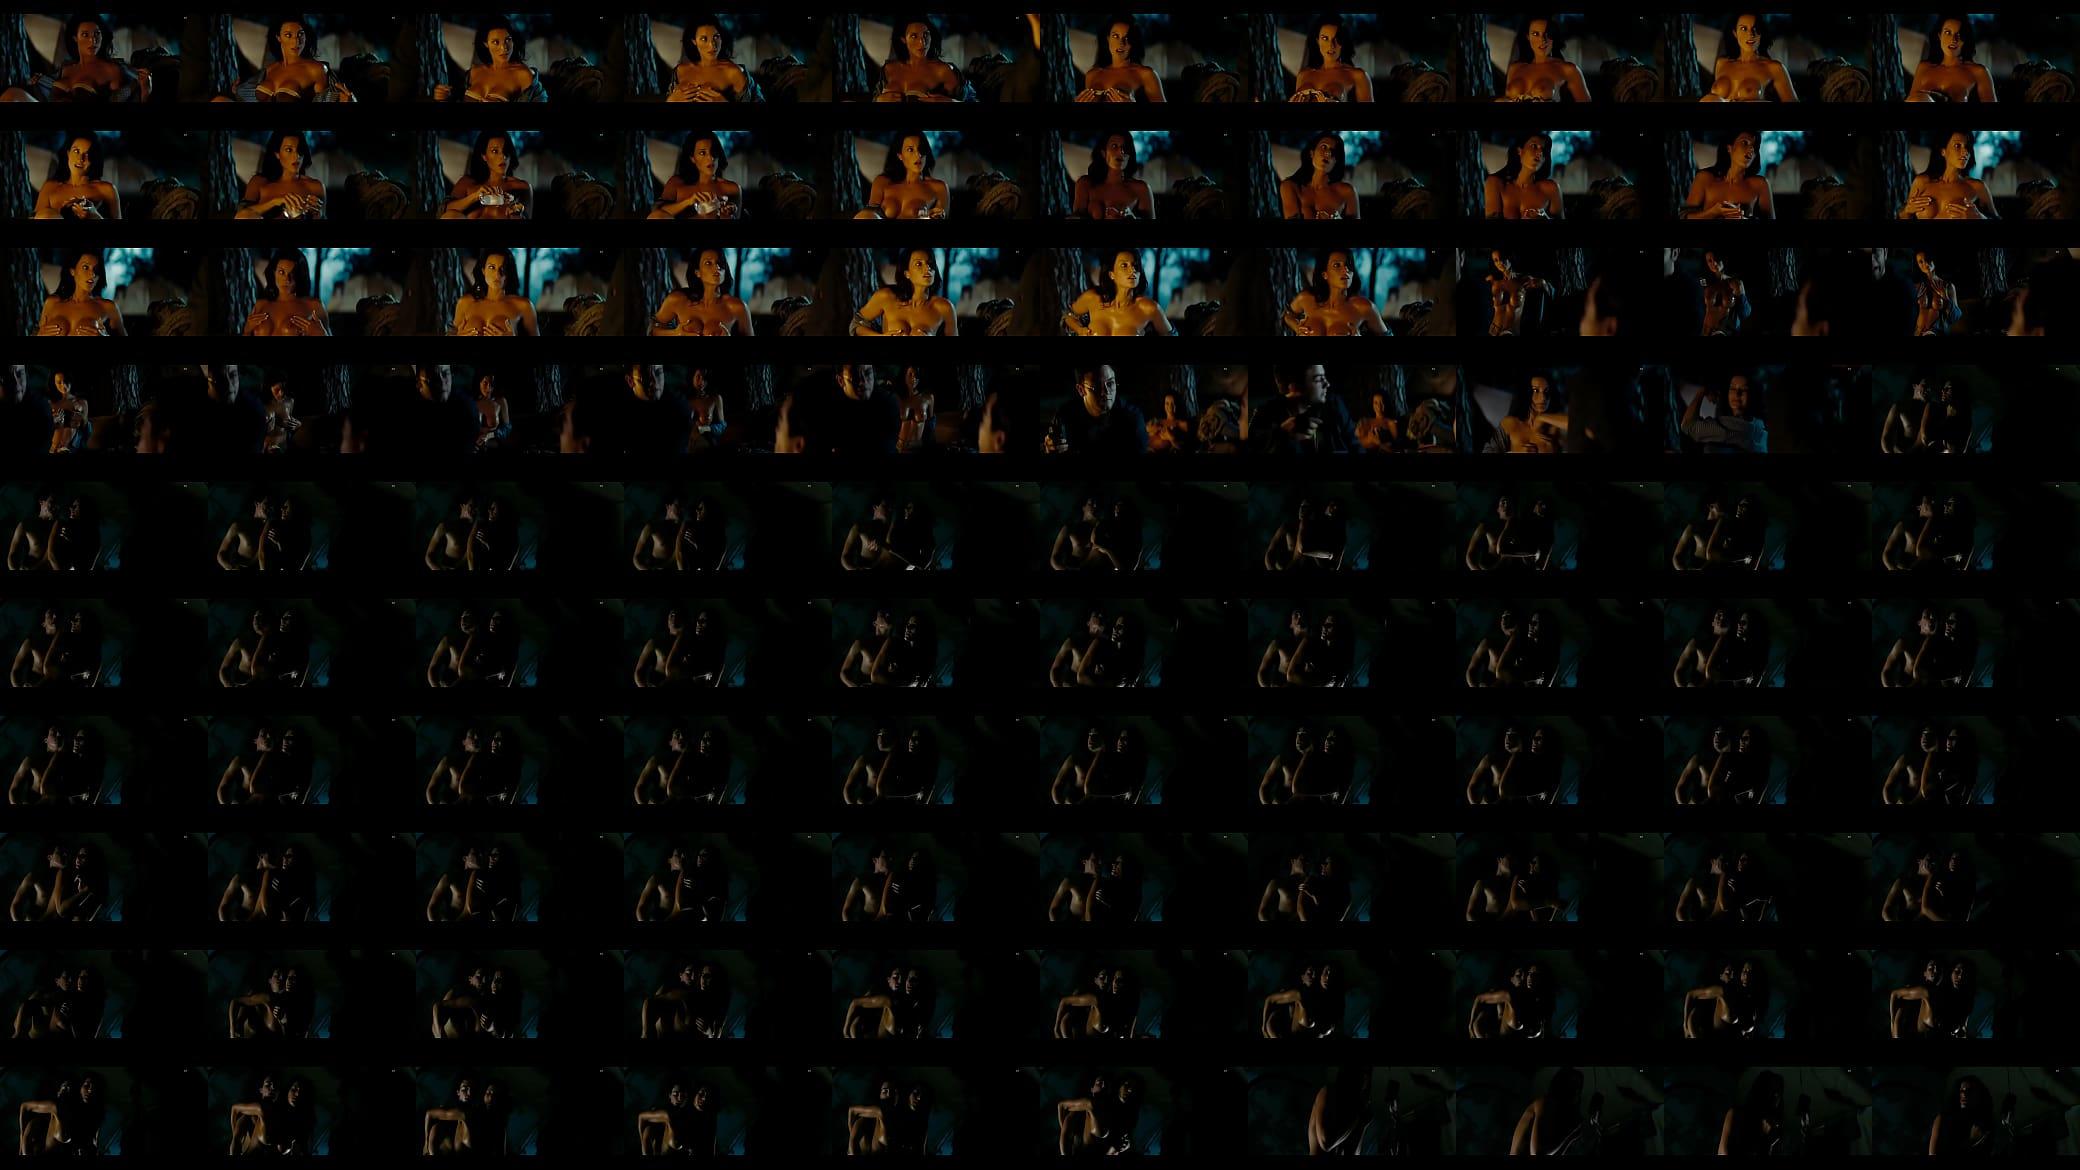 America Olivo Desnuda america olivo - friday the 13th - xvideos